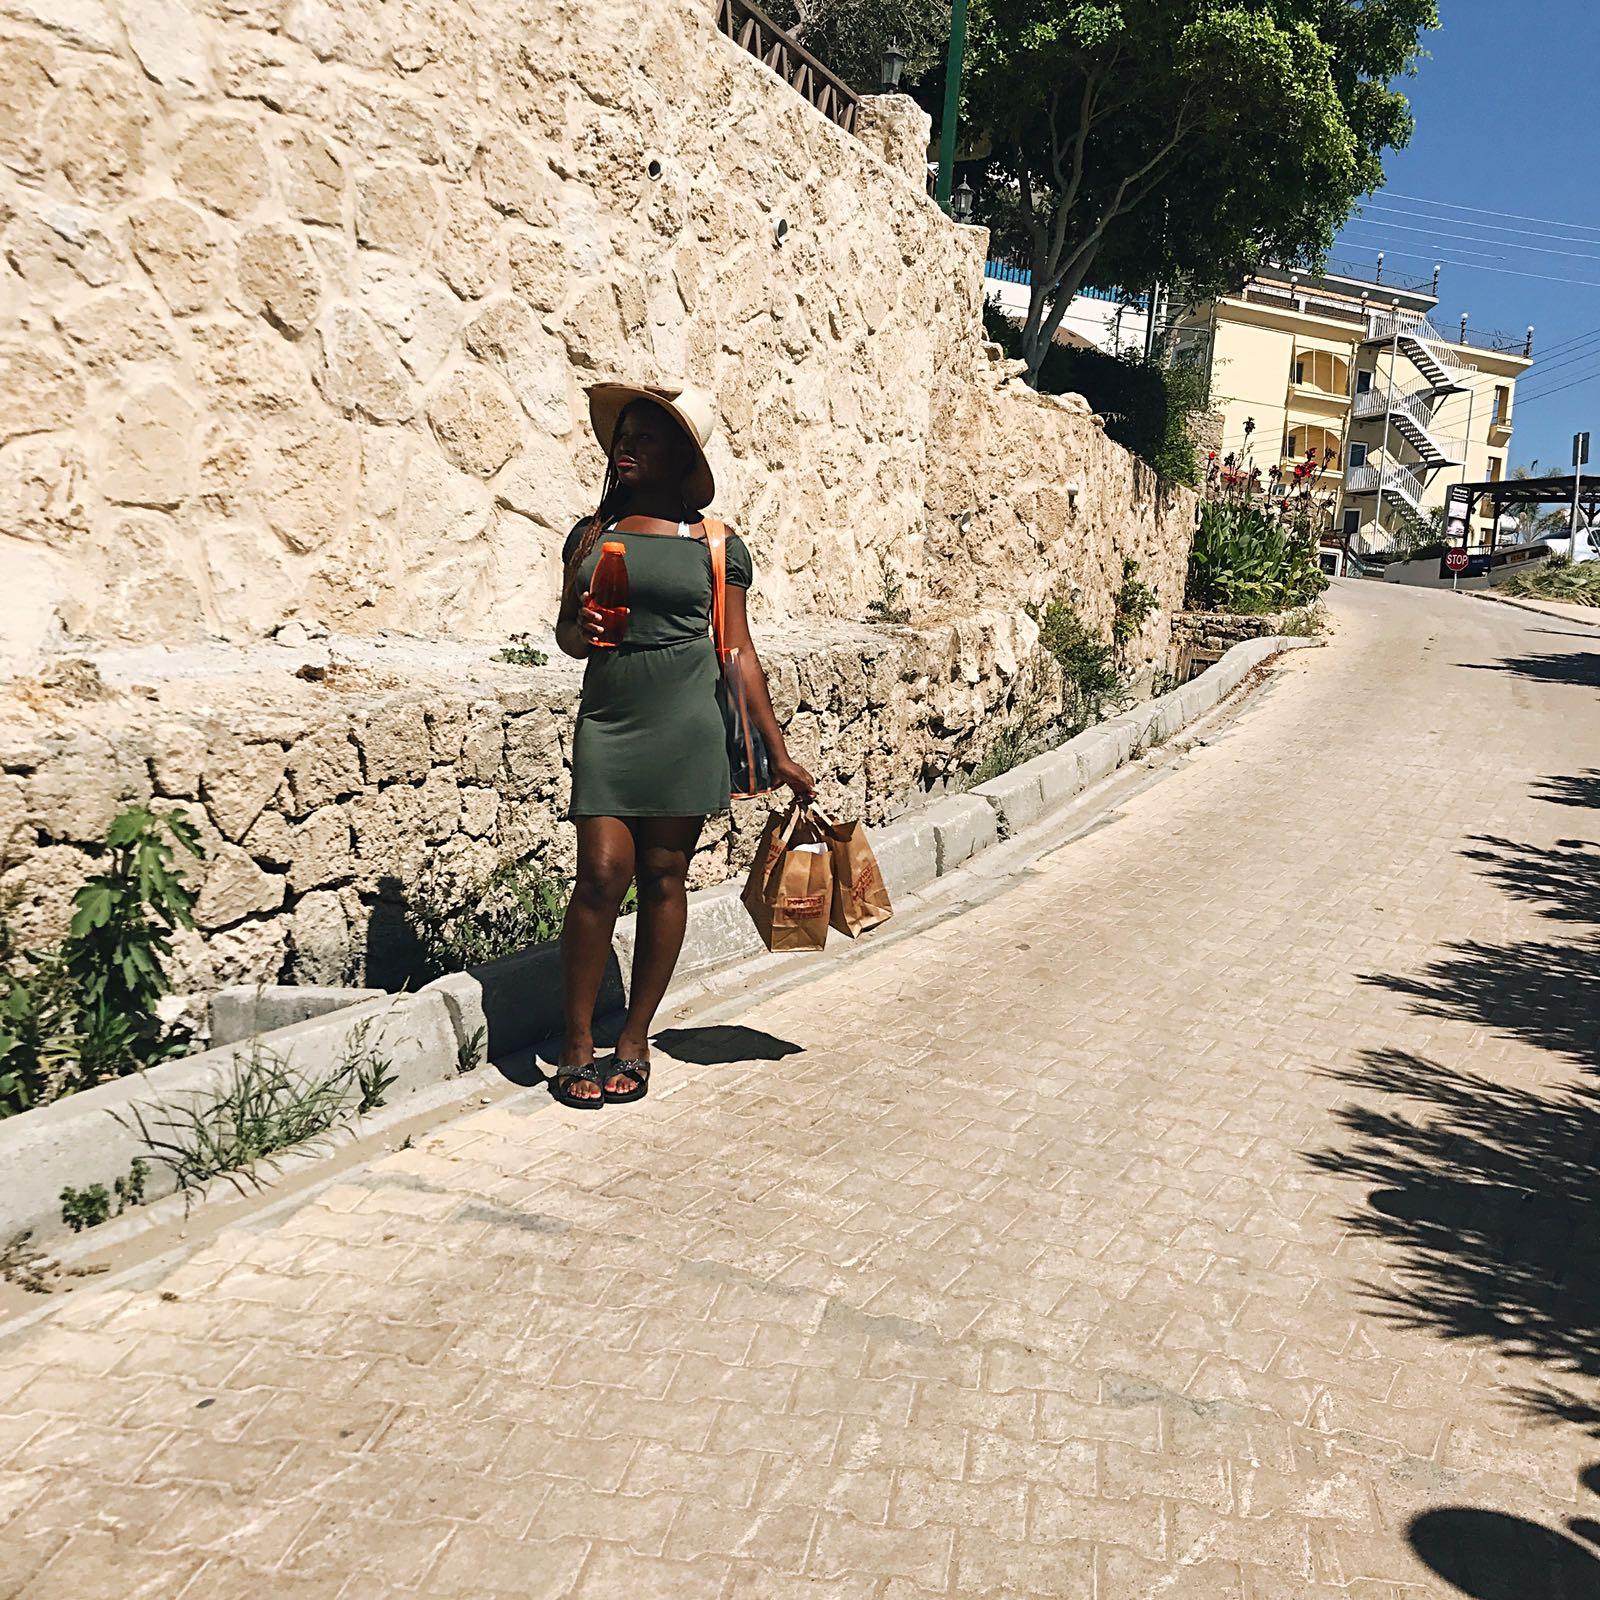 summer beach day, straw hat, sun glasses, beach dress glowing skin